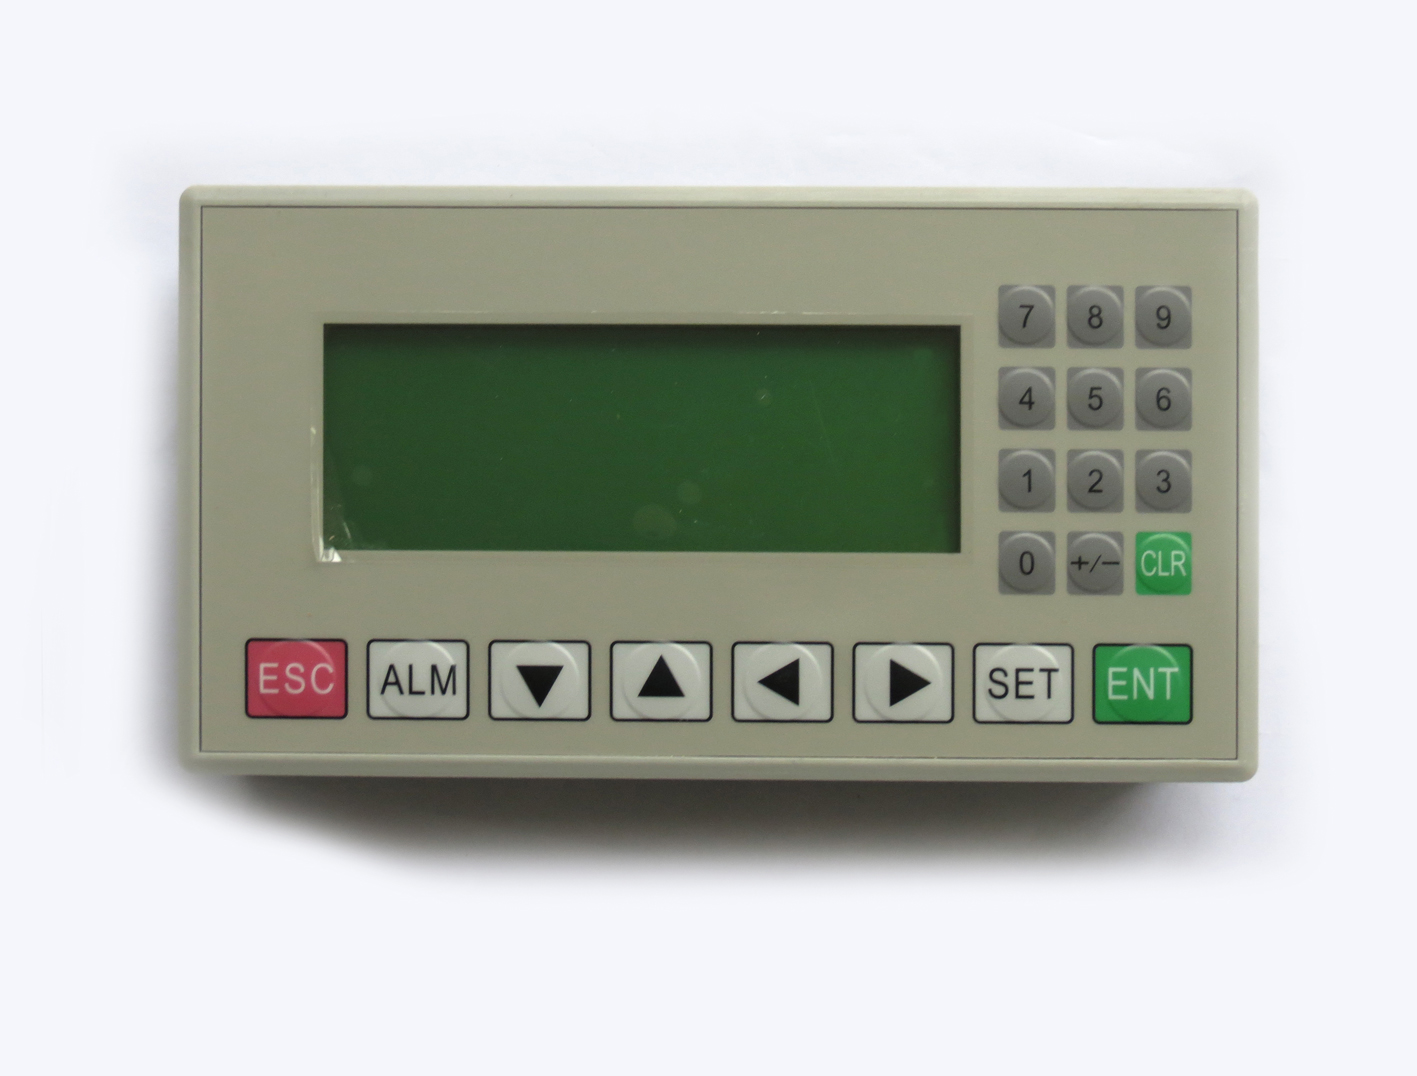 黄石科威 MP1系列一体机产品 MP1-10M08R/10M08T1/10M04R(04T1)